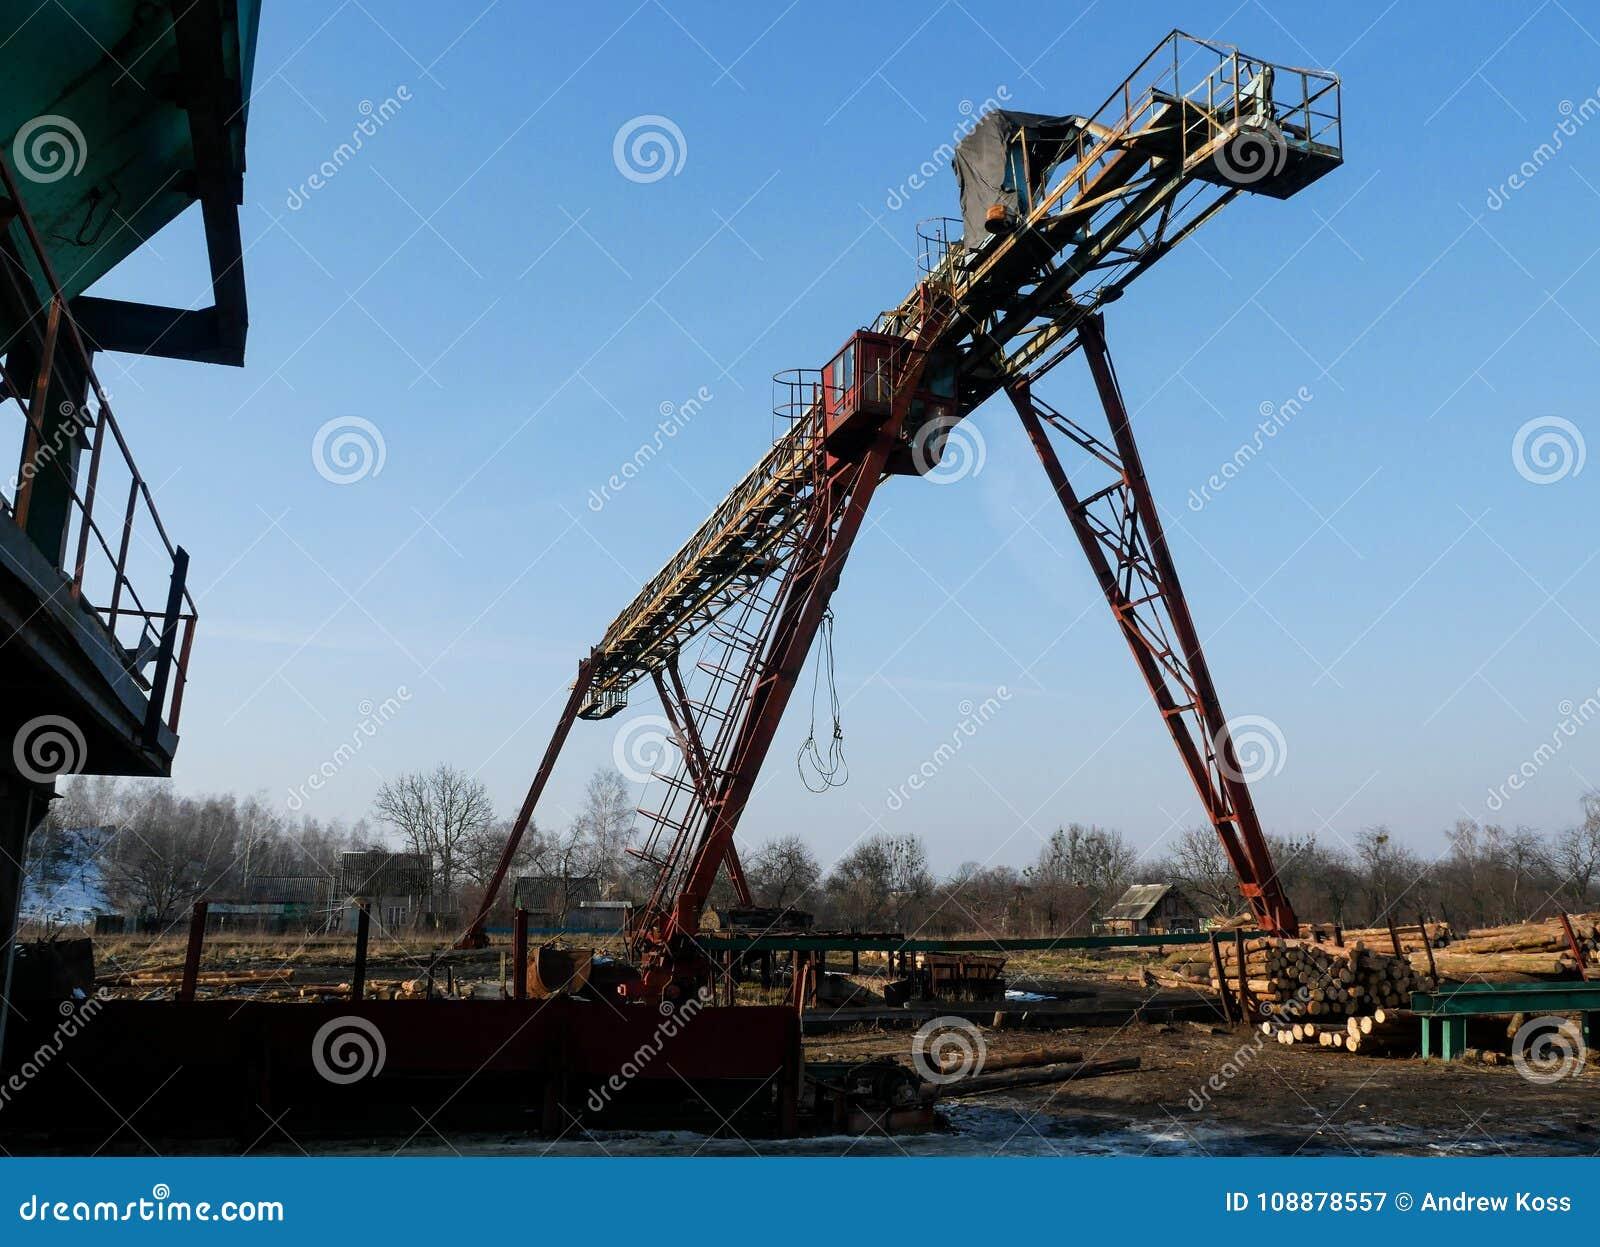 Zaagmolen industriële machine